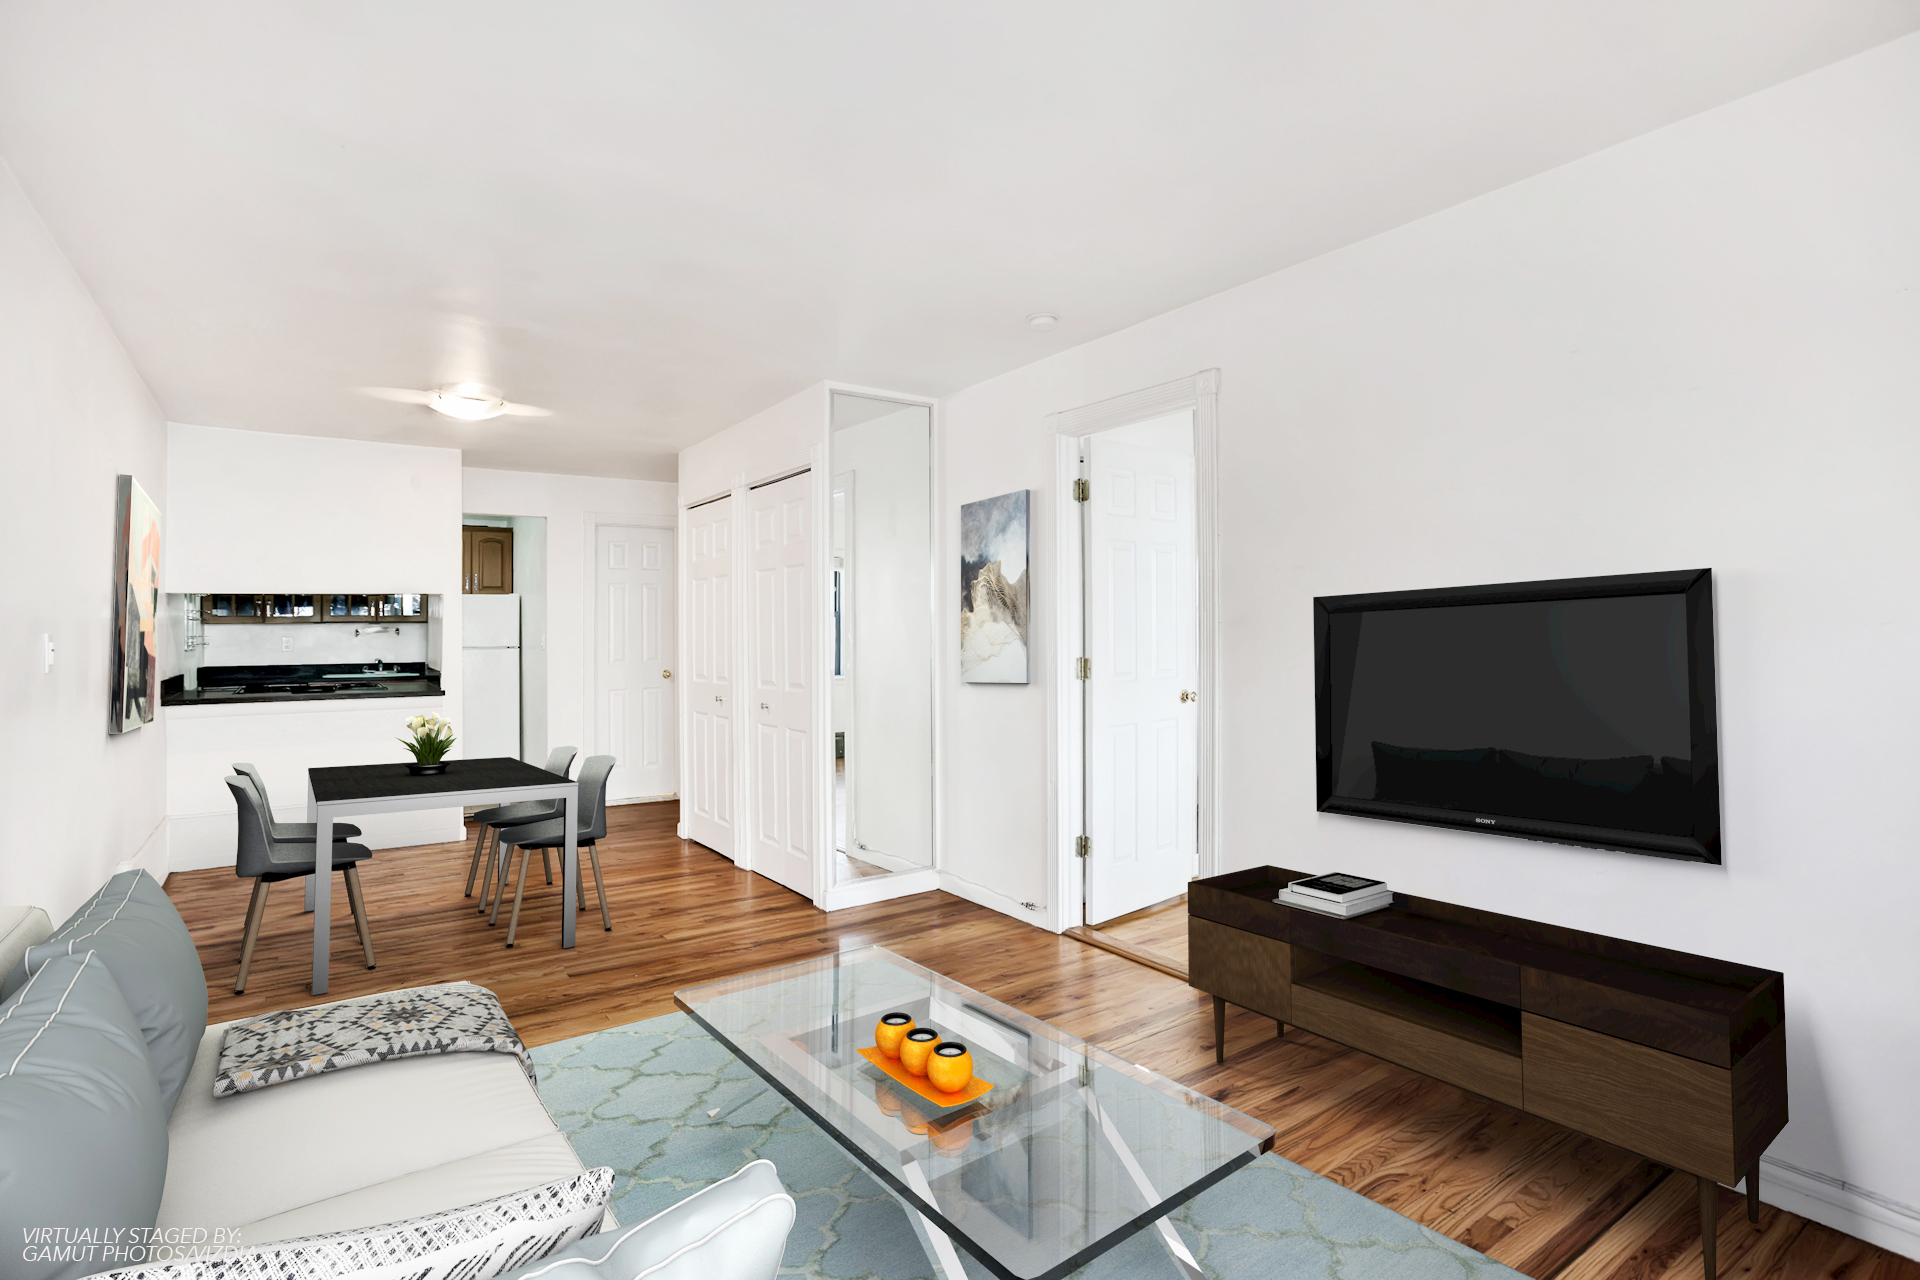 424 West 49th Street, Unit 3A - $790,000